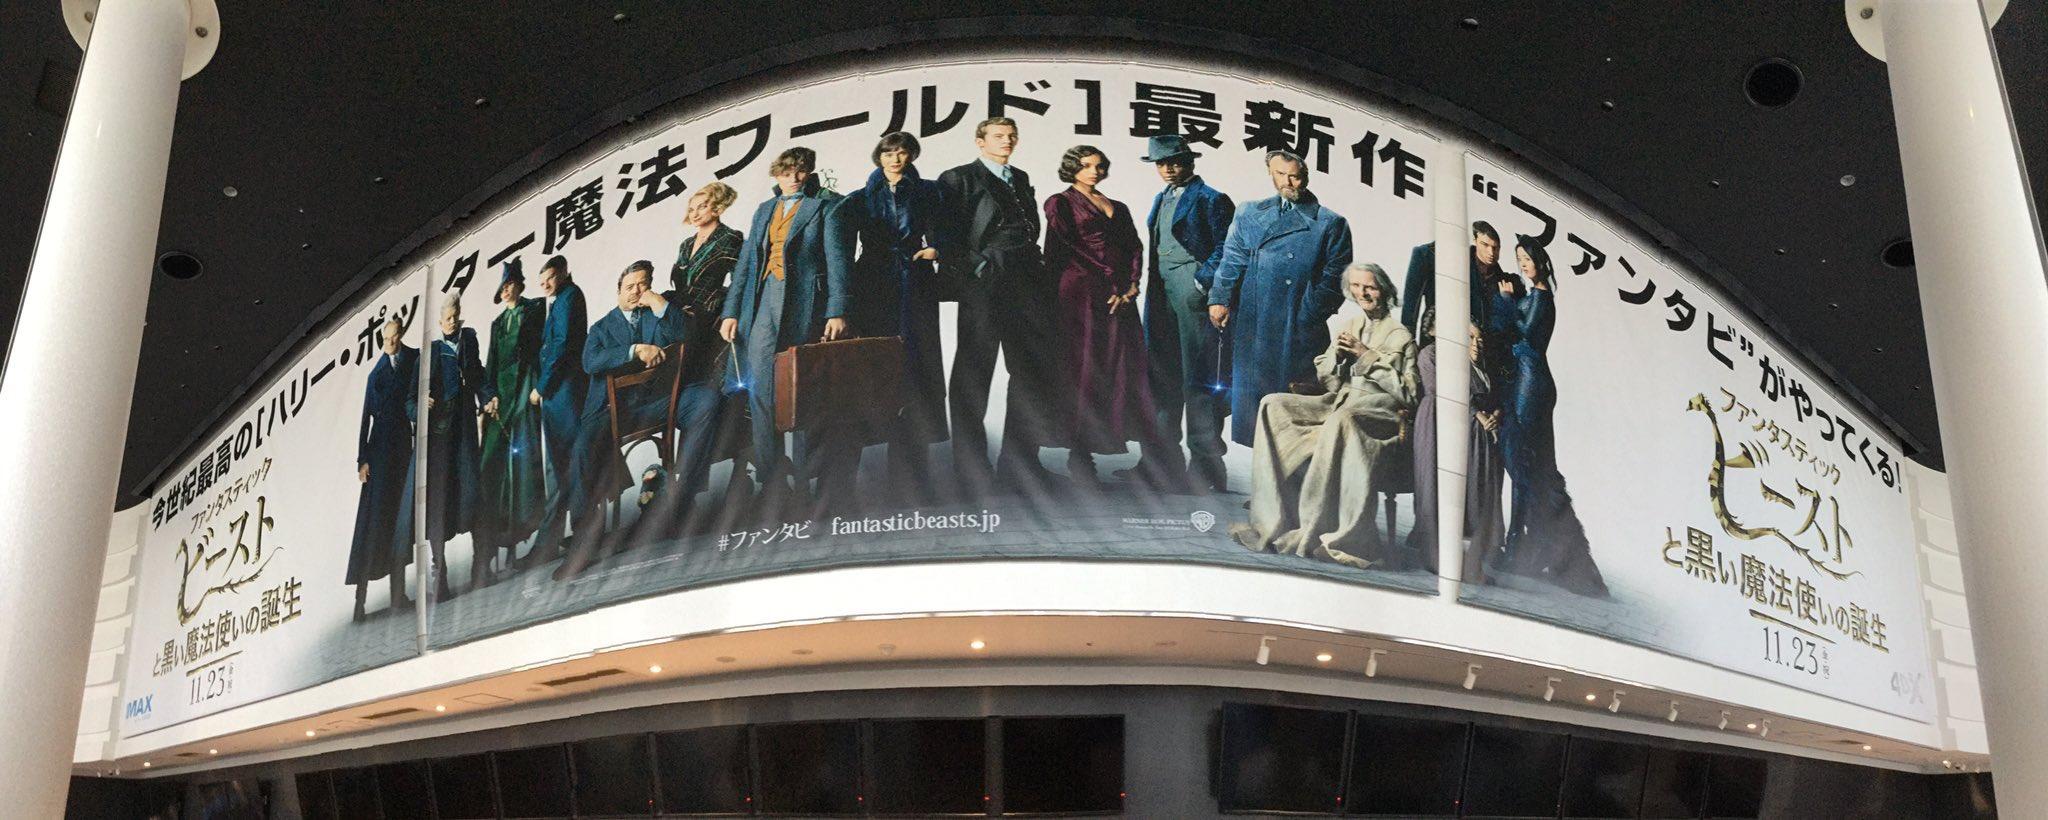 billboard japon